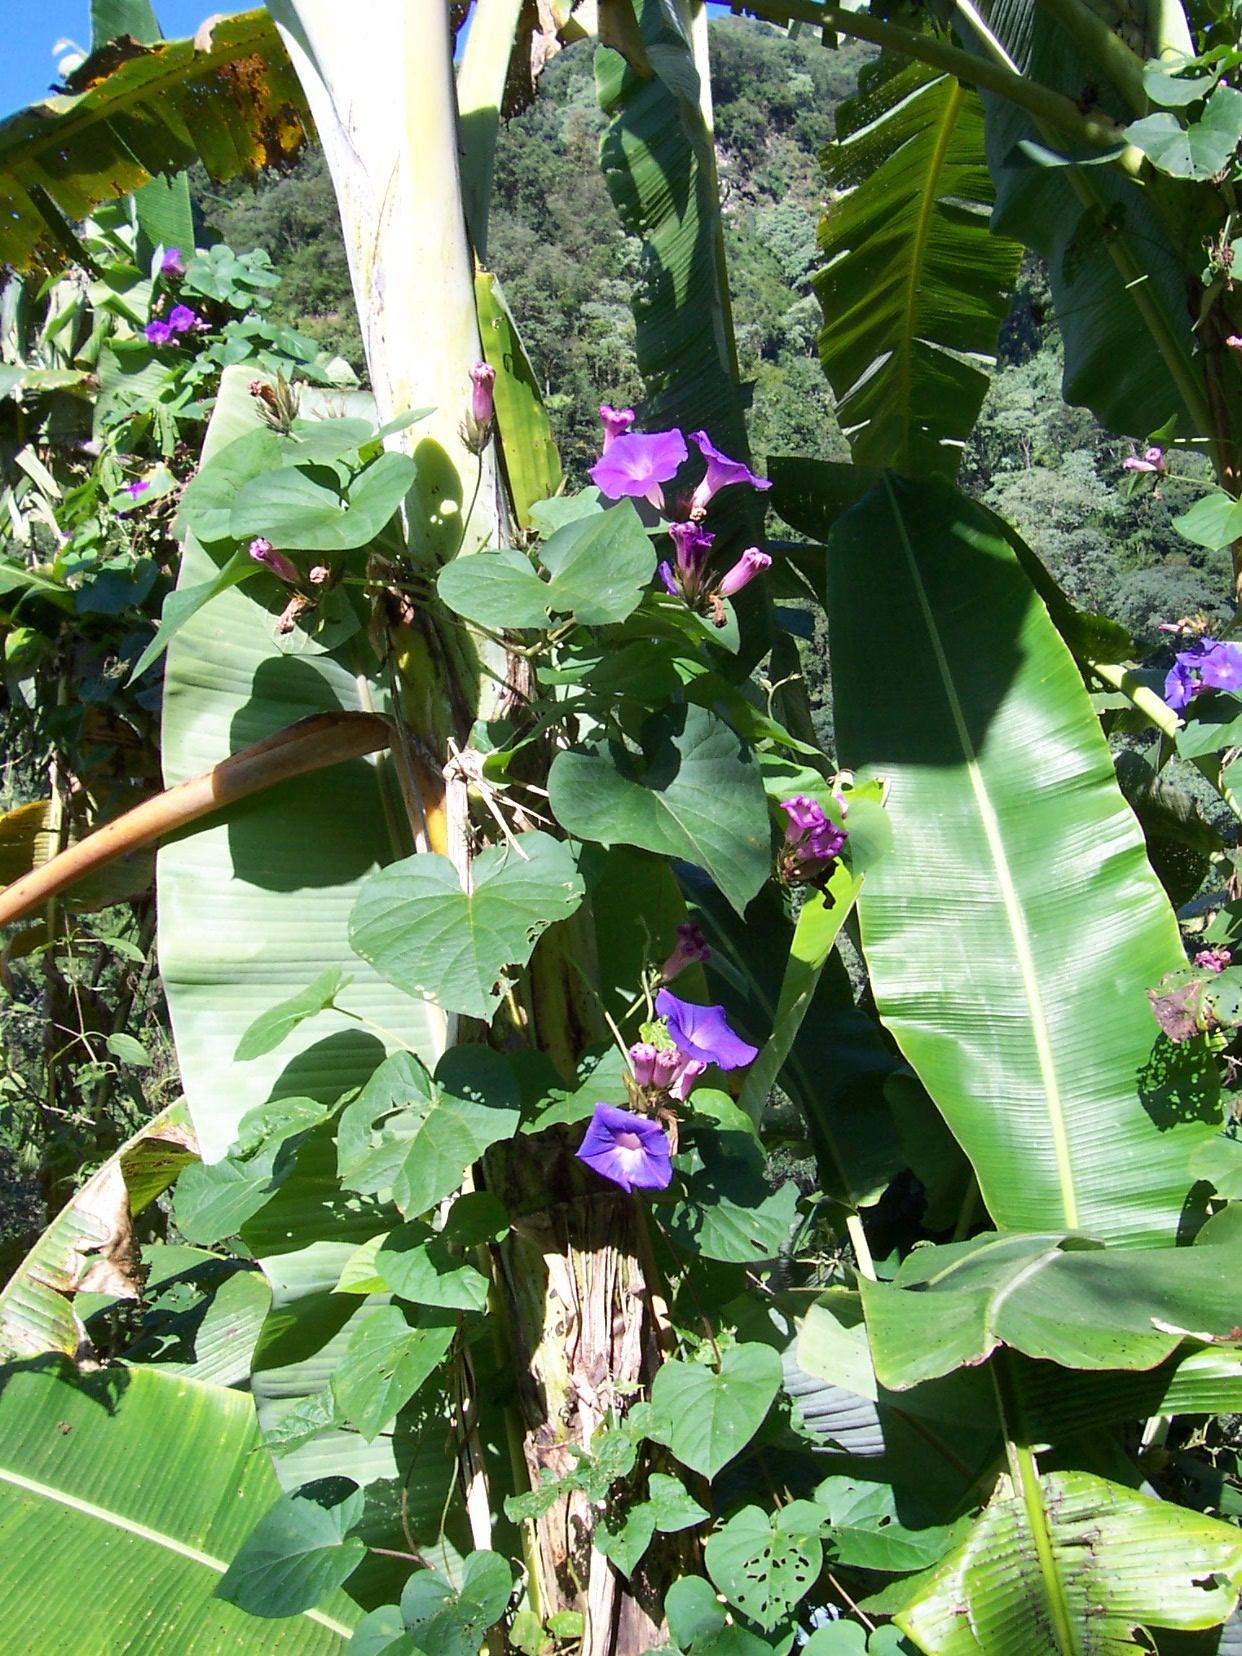 tropical plants and flowers tropics green leaves annet bananaplant banana bananatree